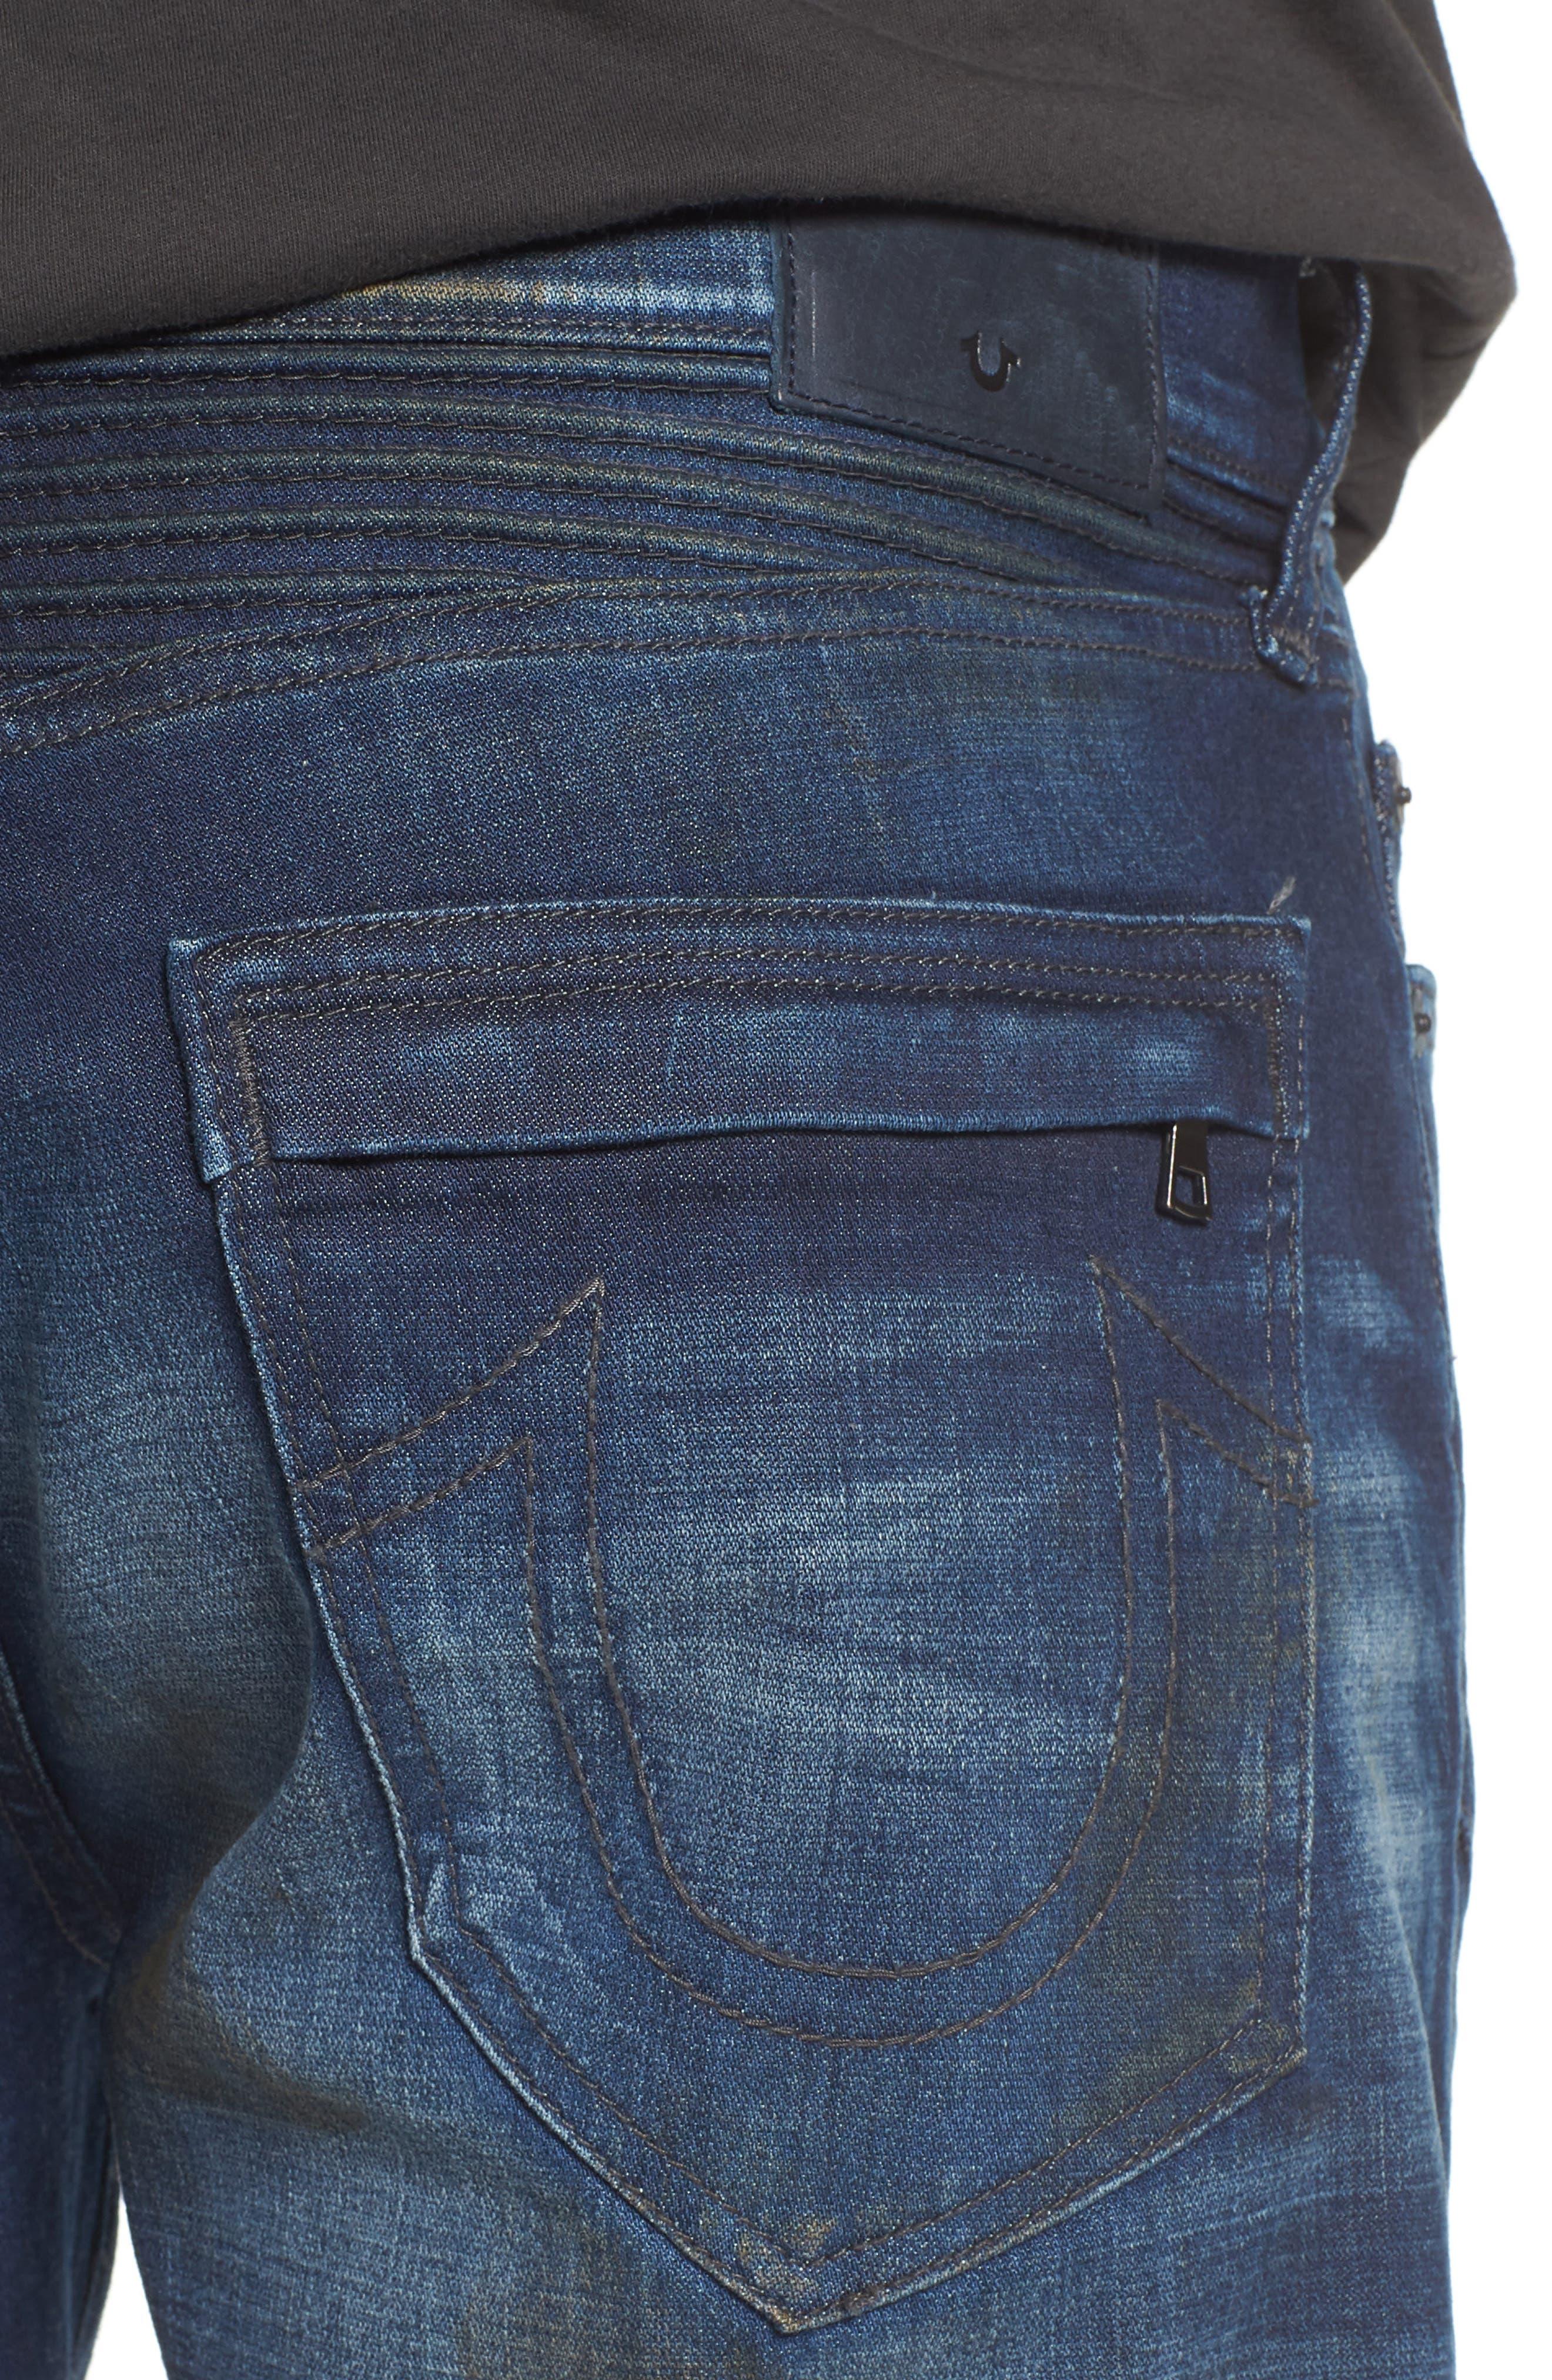 Geno Straight Leg Jeans,                             Alternate thumbnail 4, color,                             Fragment Shadow